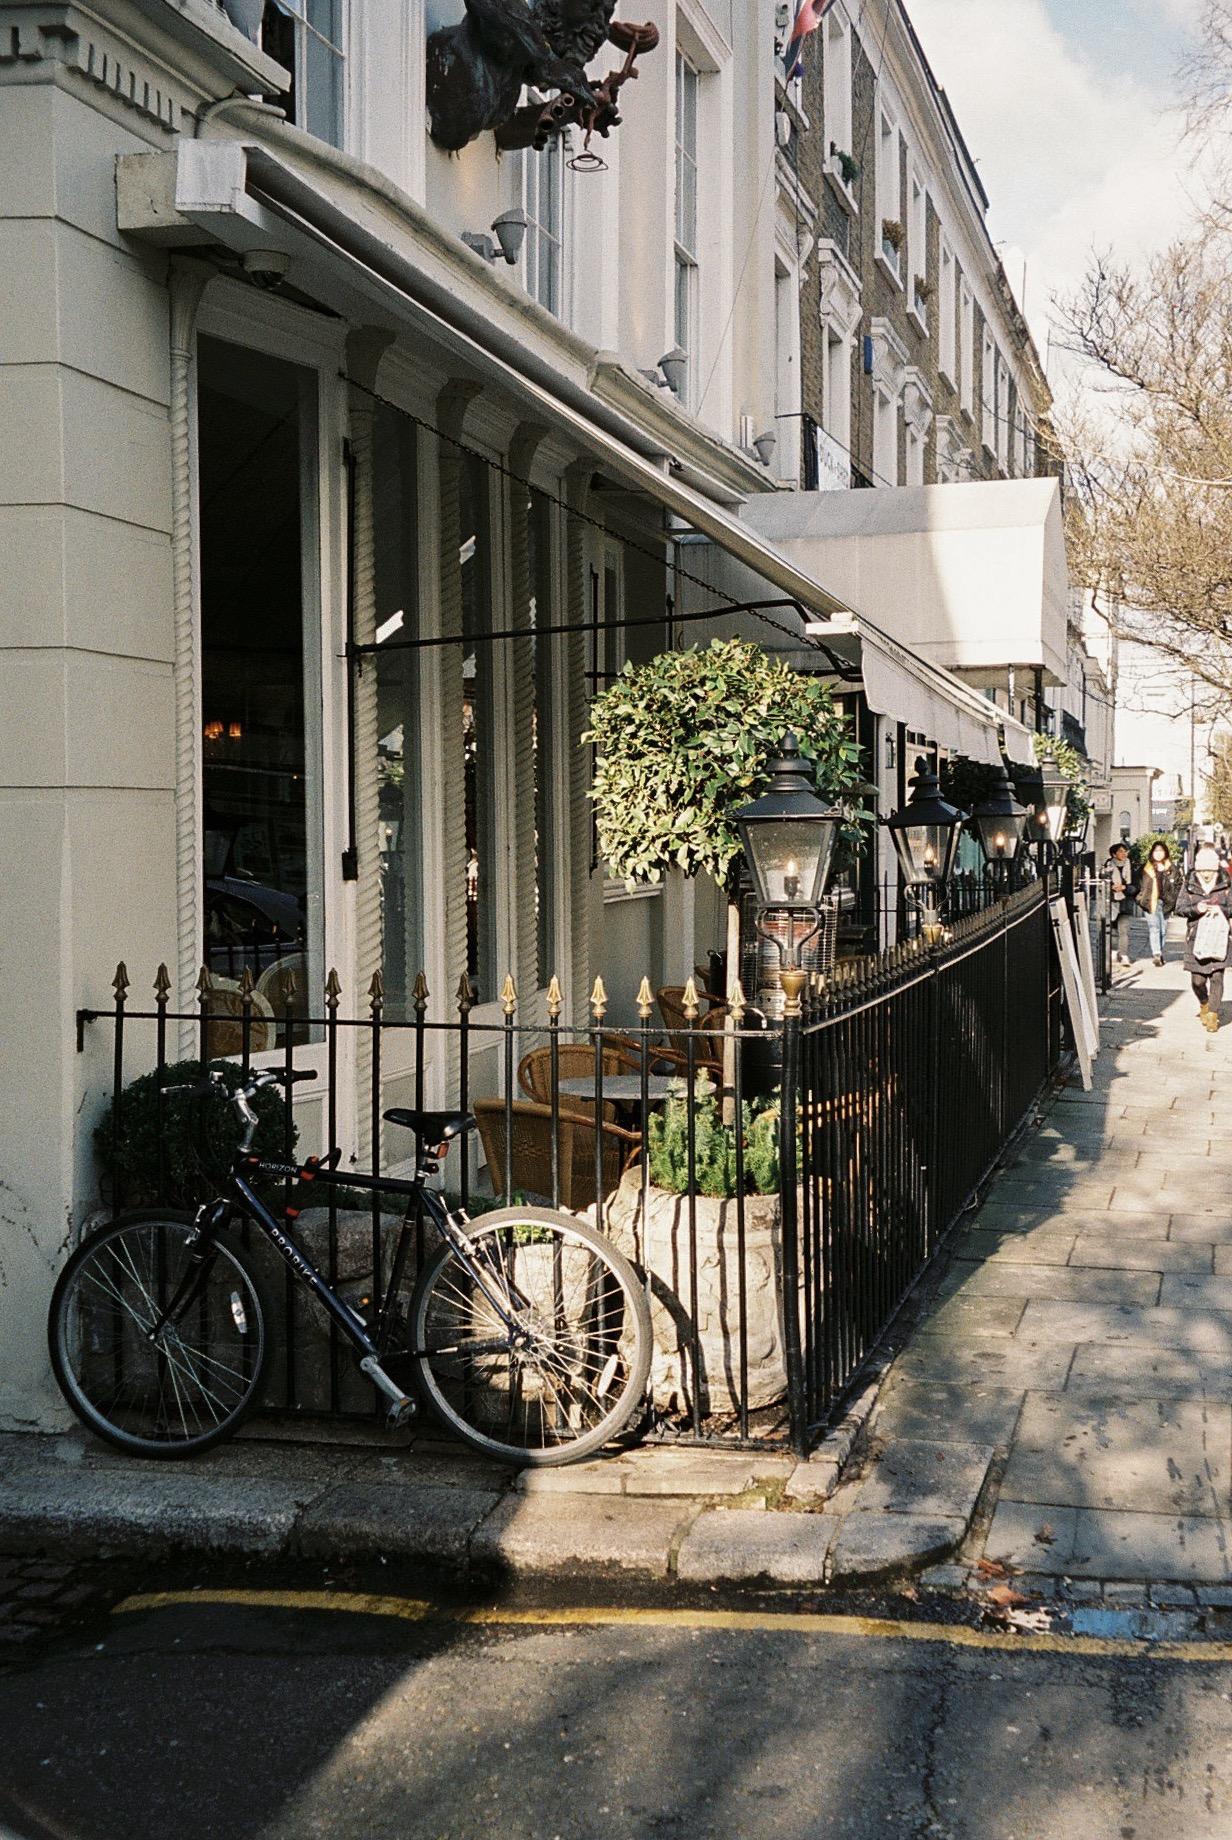 Photo taken by West Bourne Grove, one of the coolest streets in Notting Hill, with lots of independent shops and cute cafés.  / Foto tirada perto de West Bourne Grove, uma das ruas mais badalas em Notting Hill, com imensas lojas independentes e cafezinhos amorosos.